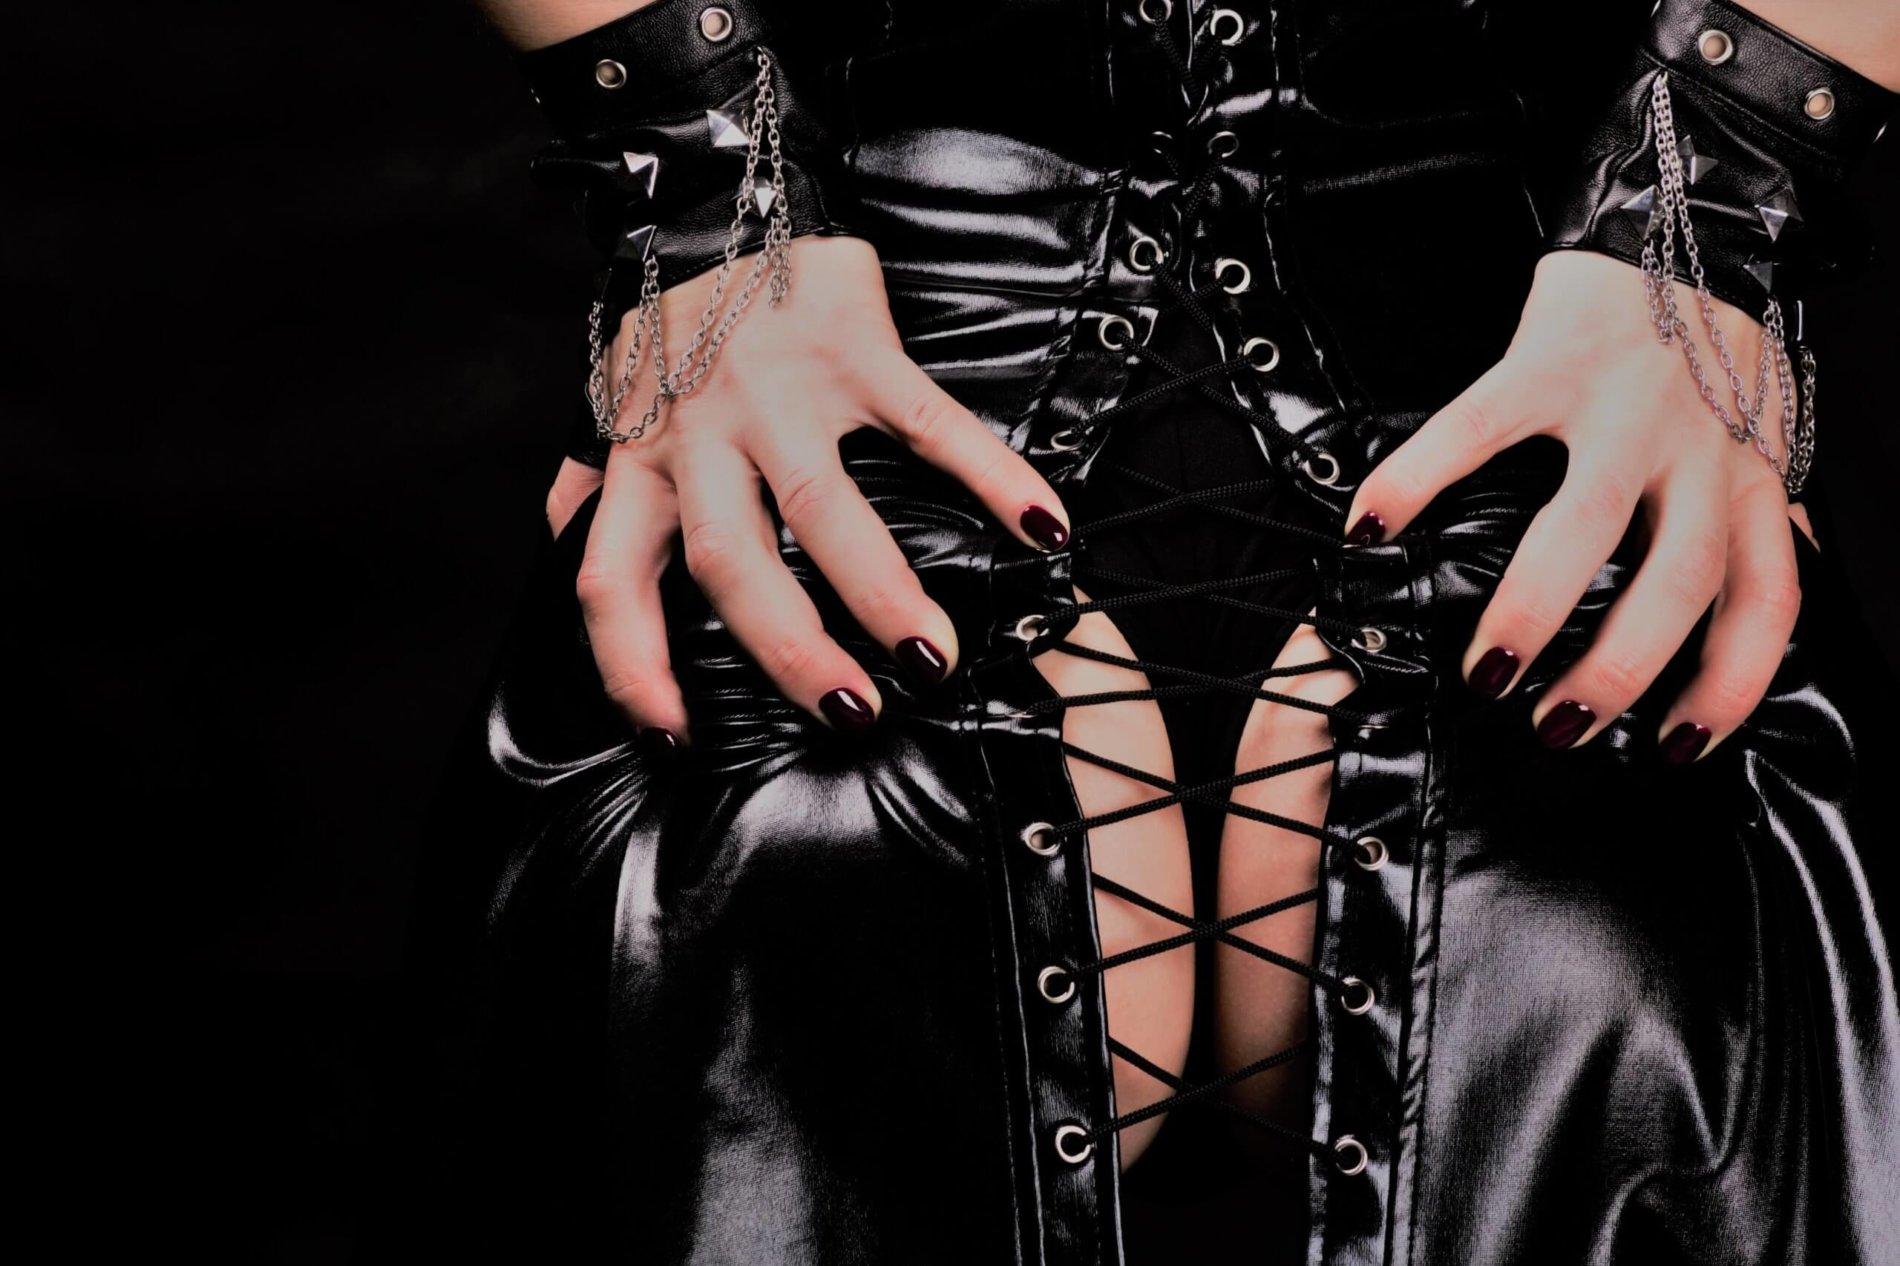 mistress undress